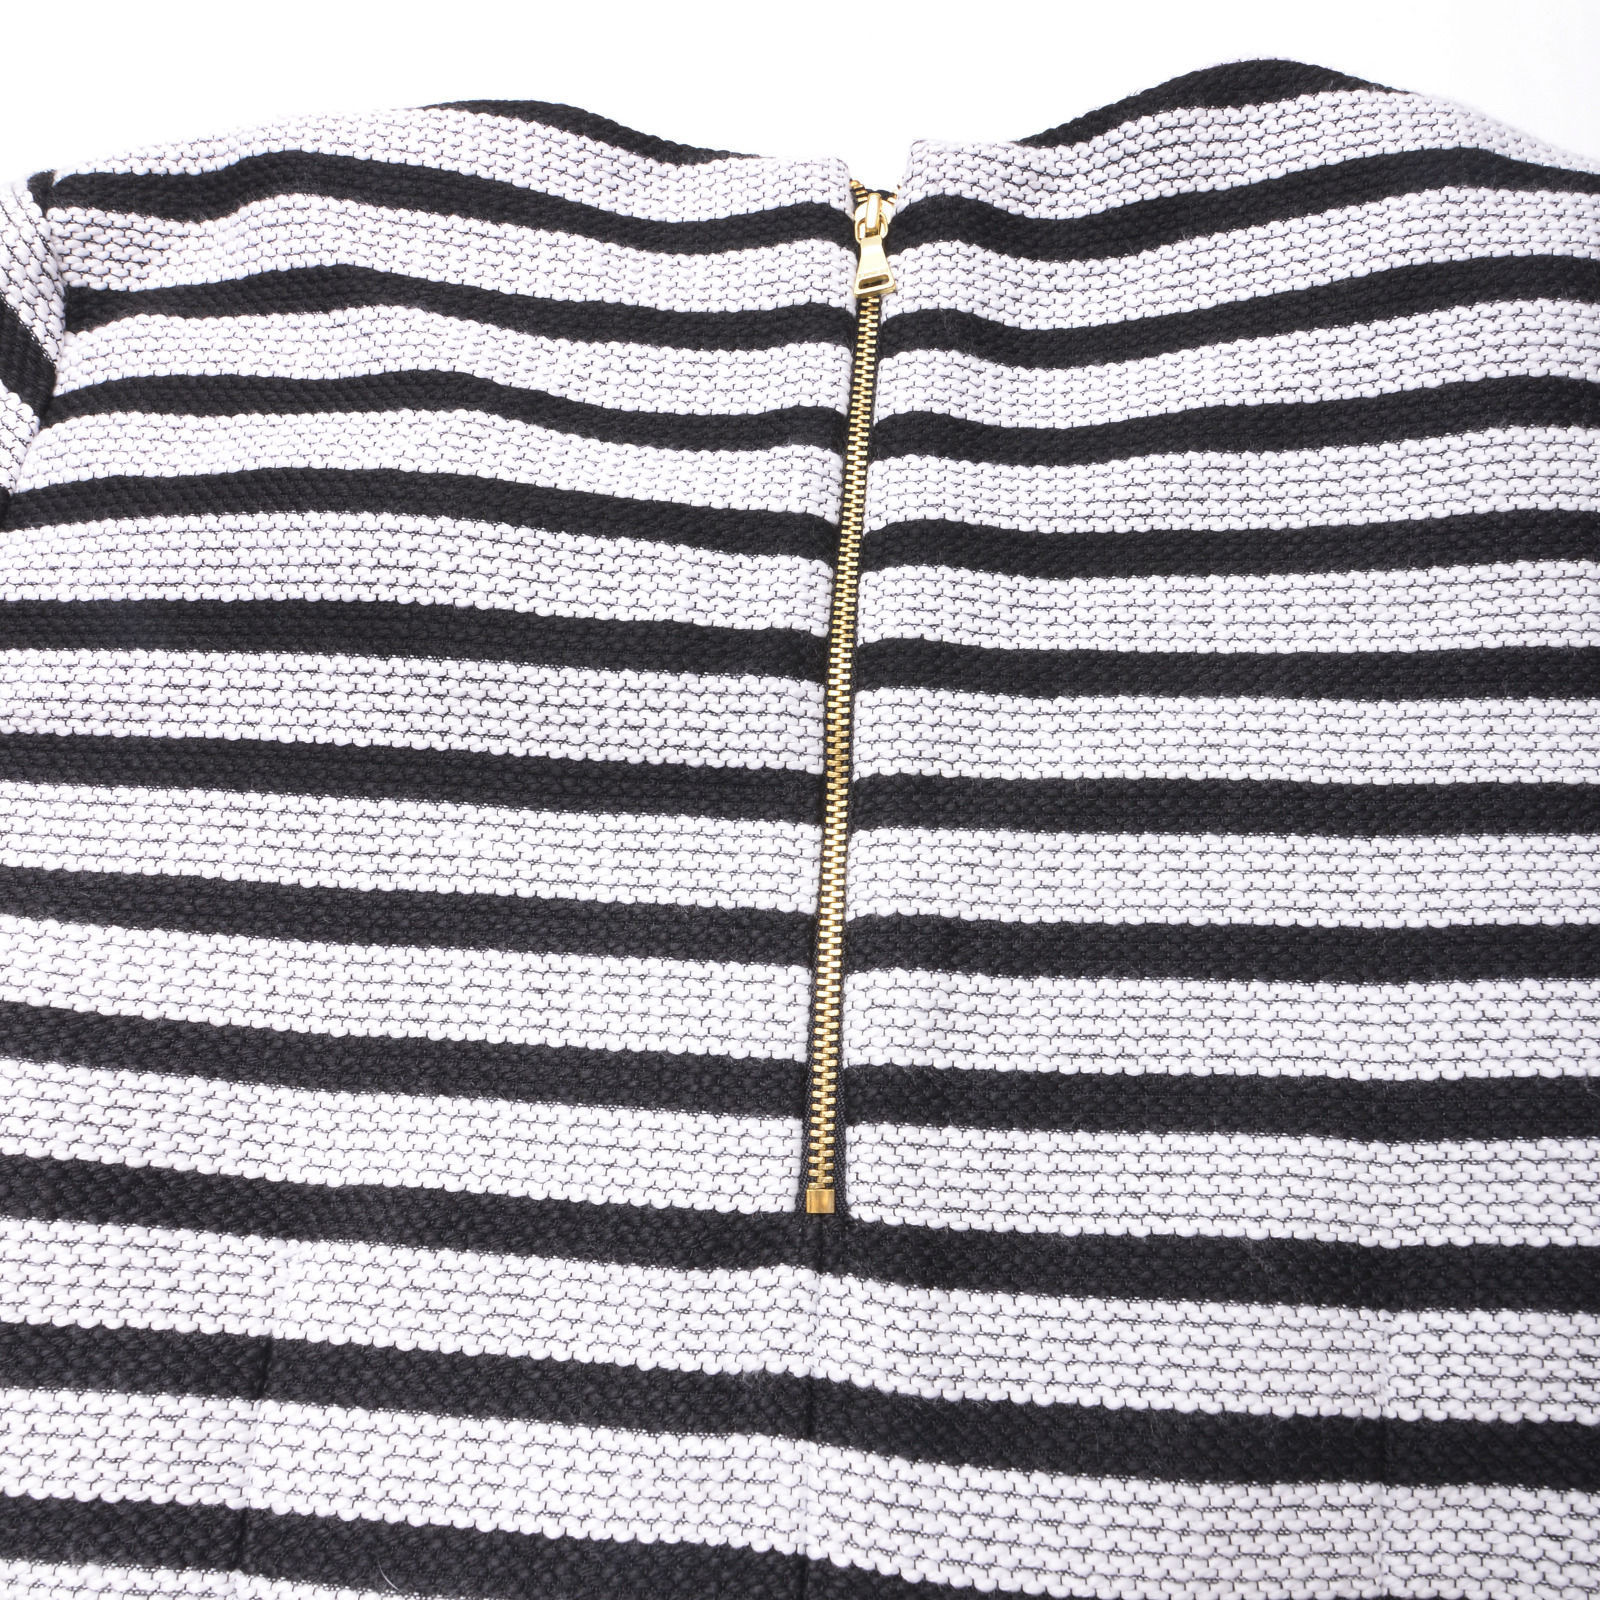 NEW EXPRESS Womens SHIRT TOP Size Medium Black White Zipped Back image 6